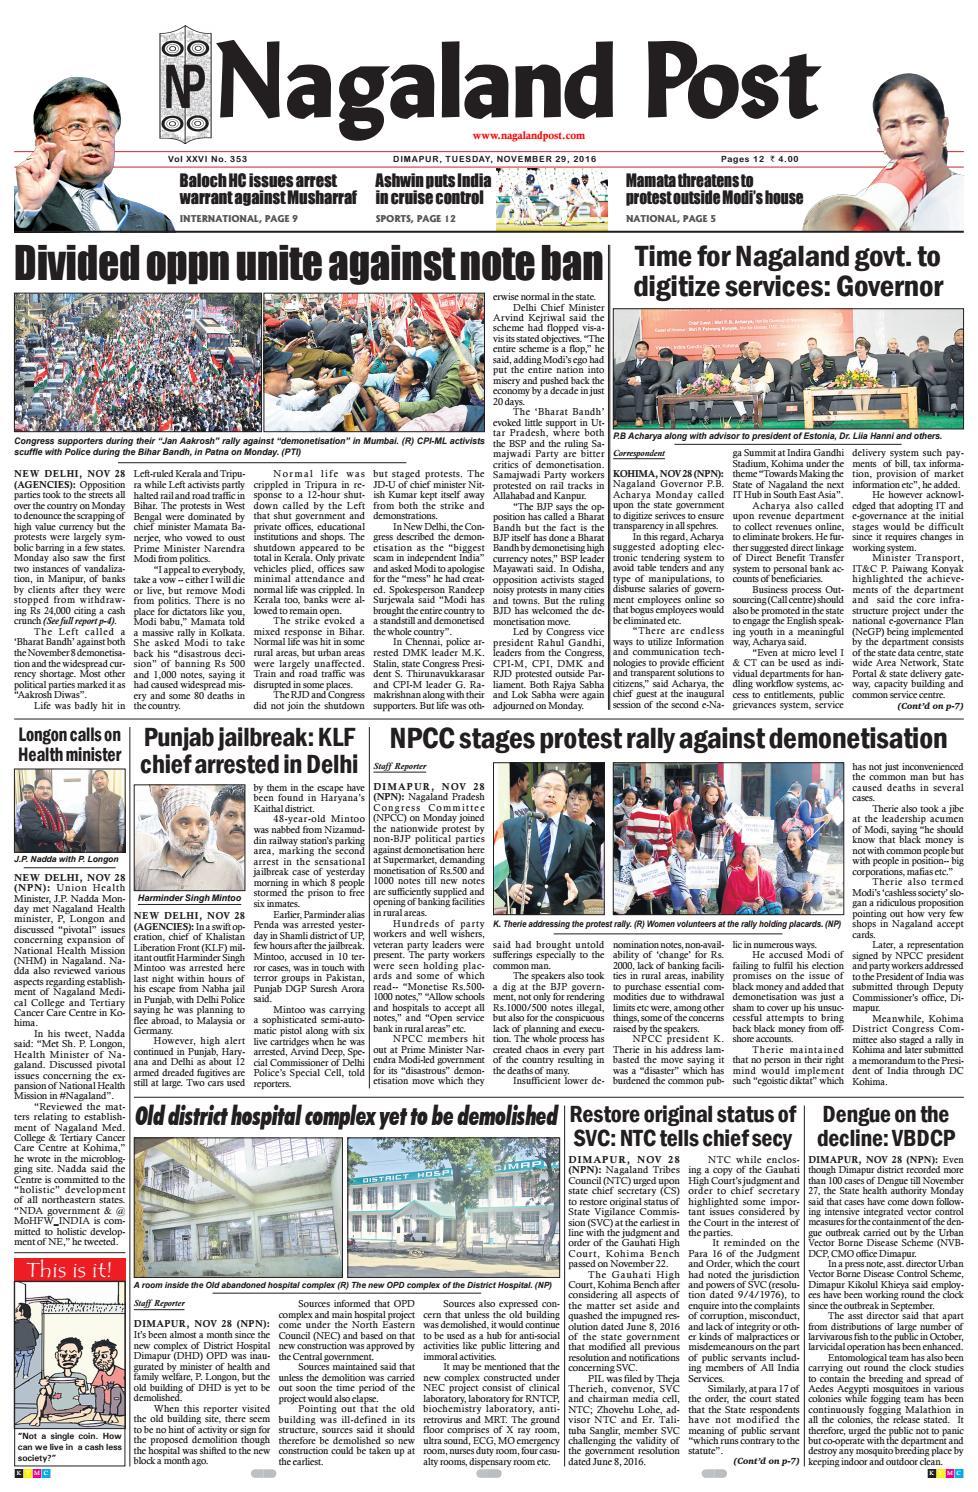 November 29, 2016 by Nagaland Post - issuu